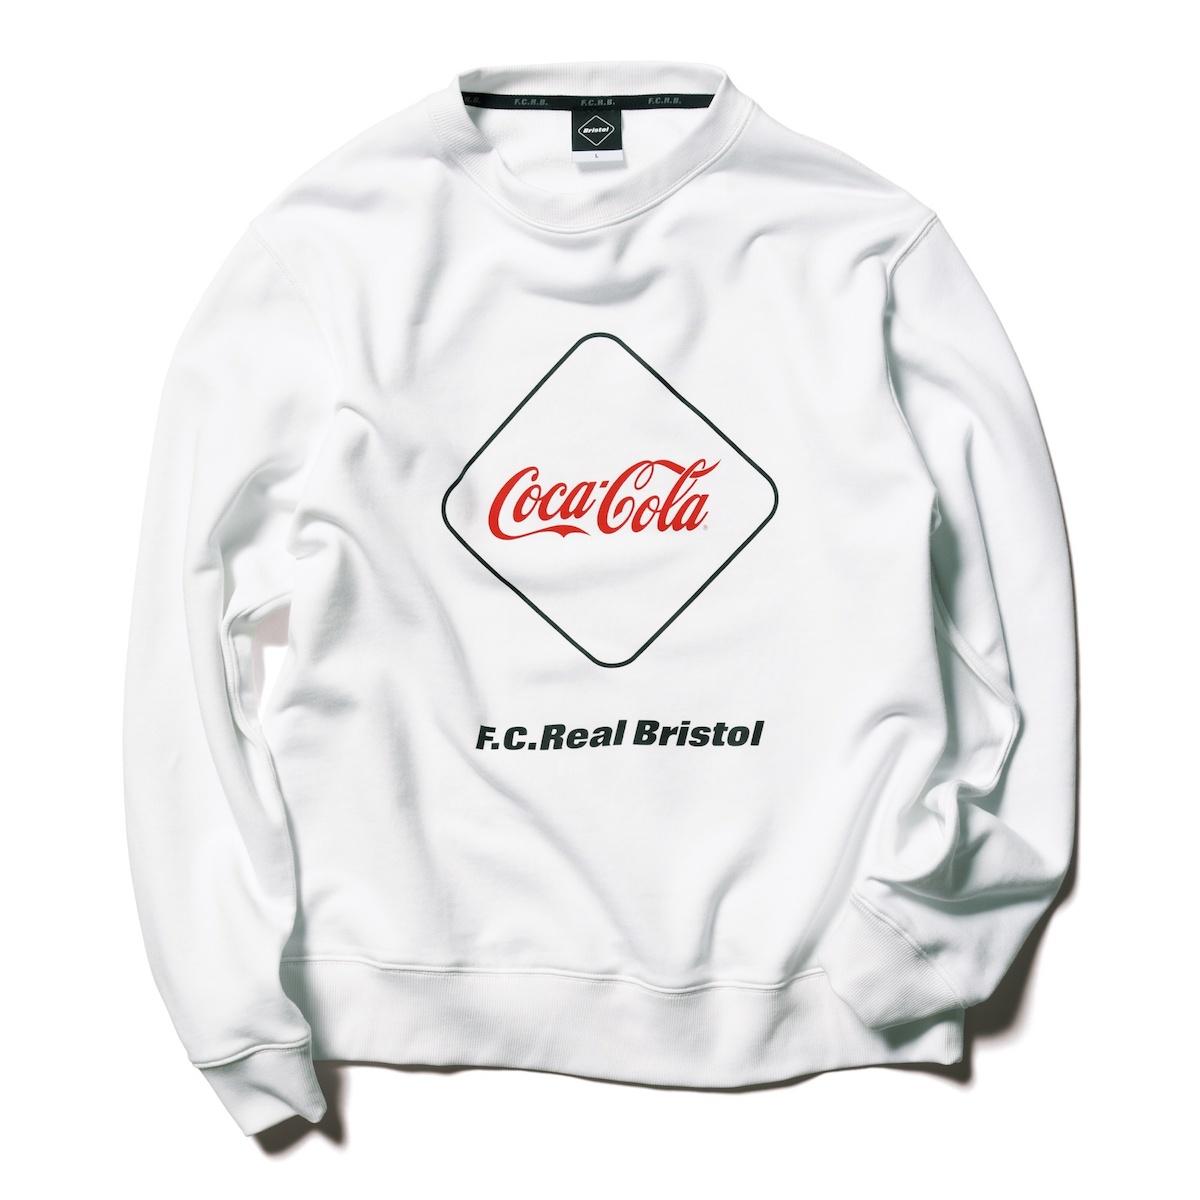 F.C.Real Bristol / COCA-COLA EMBLEM CREWNECK SWEAT (White)